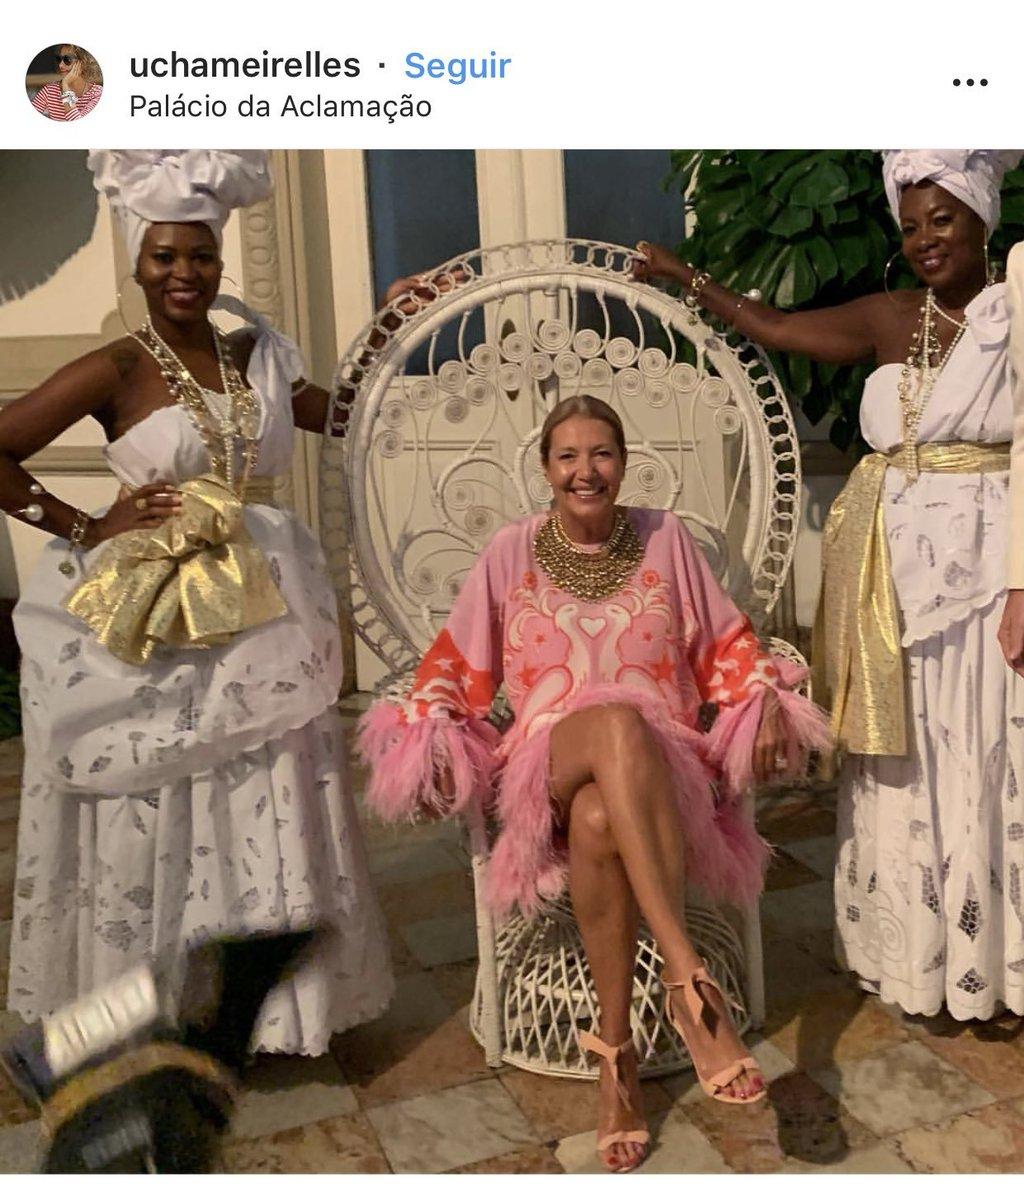 Vogue Brazil director resigns over birthday photos evoking slavery